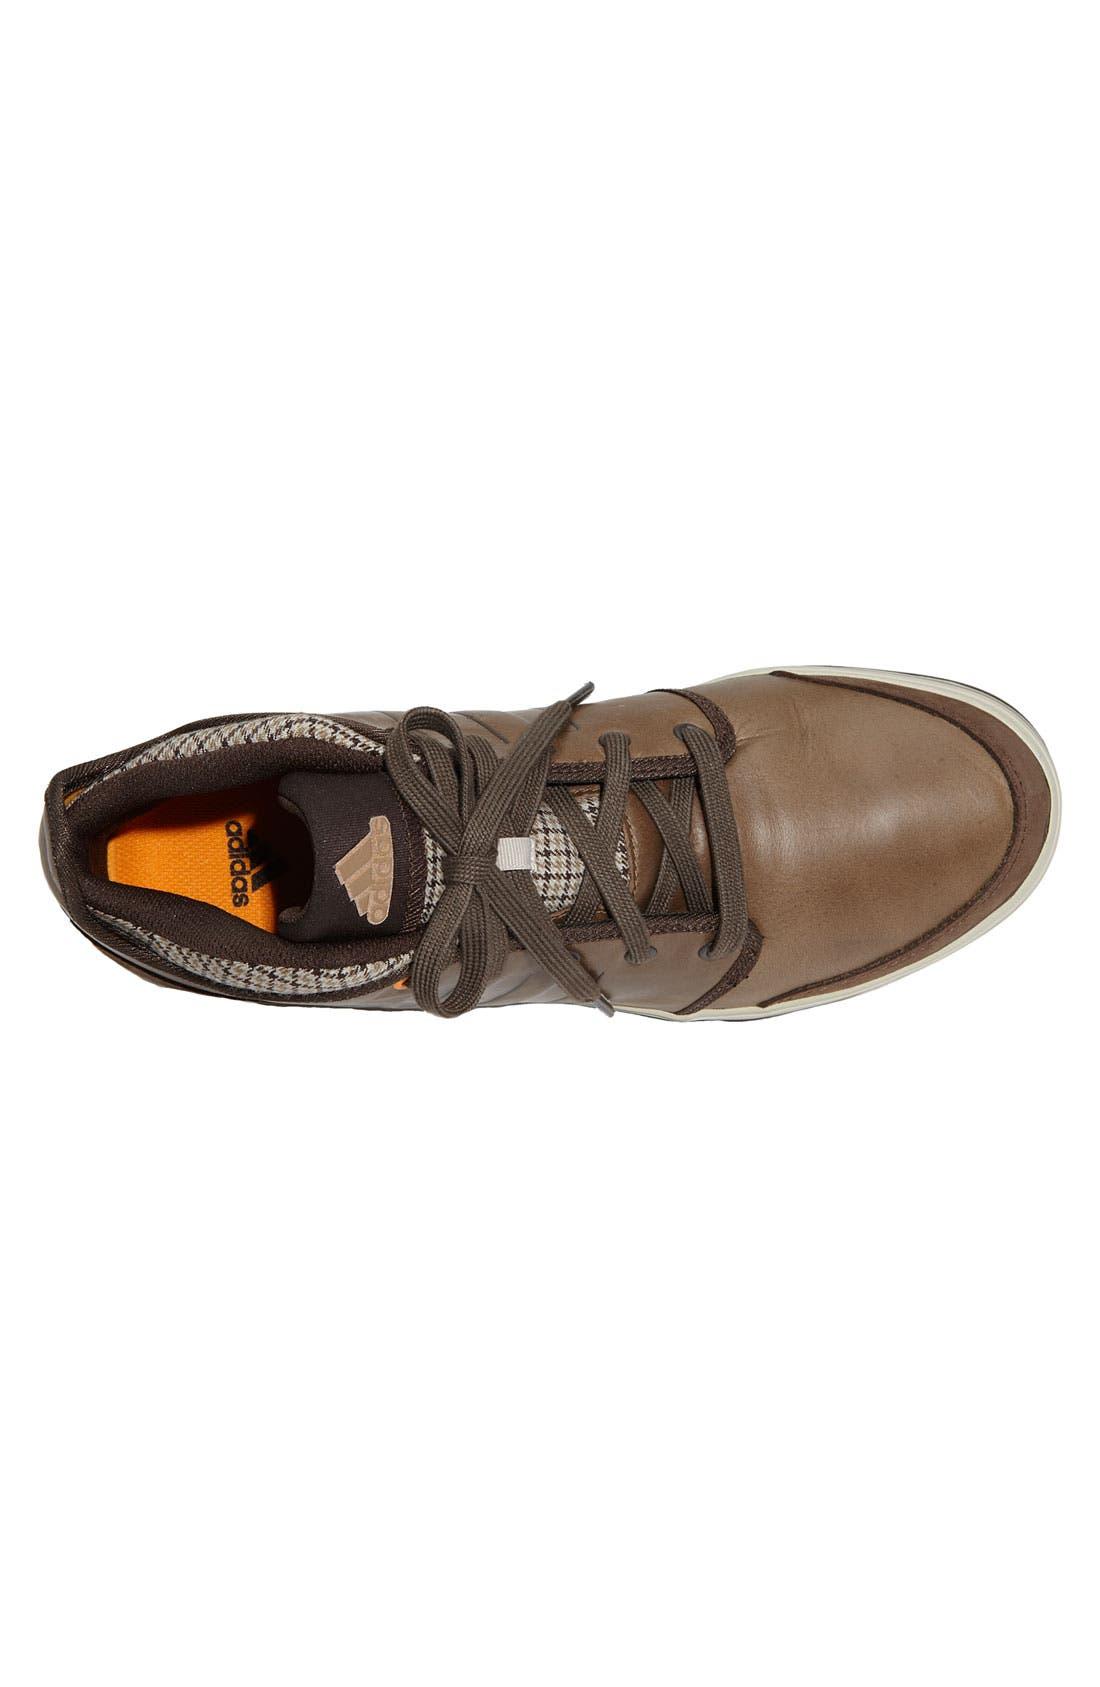 'Zeitfrei Mid' Sneaker,                             Alternate thumbnail 3, color,                             200